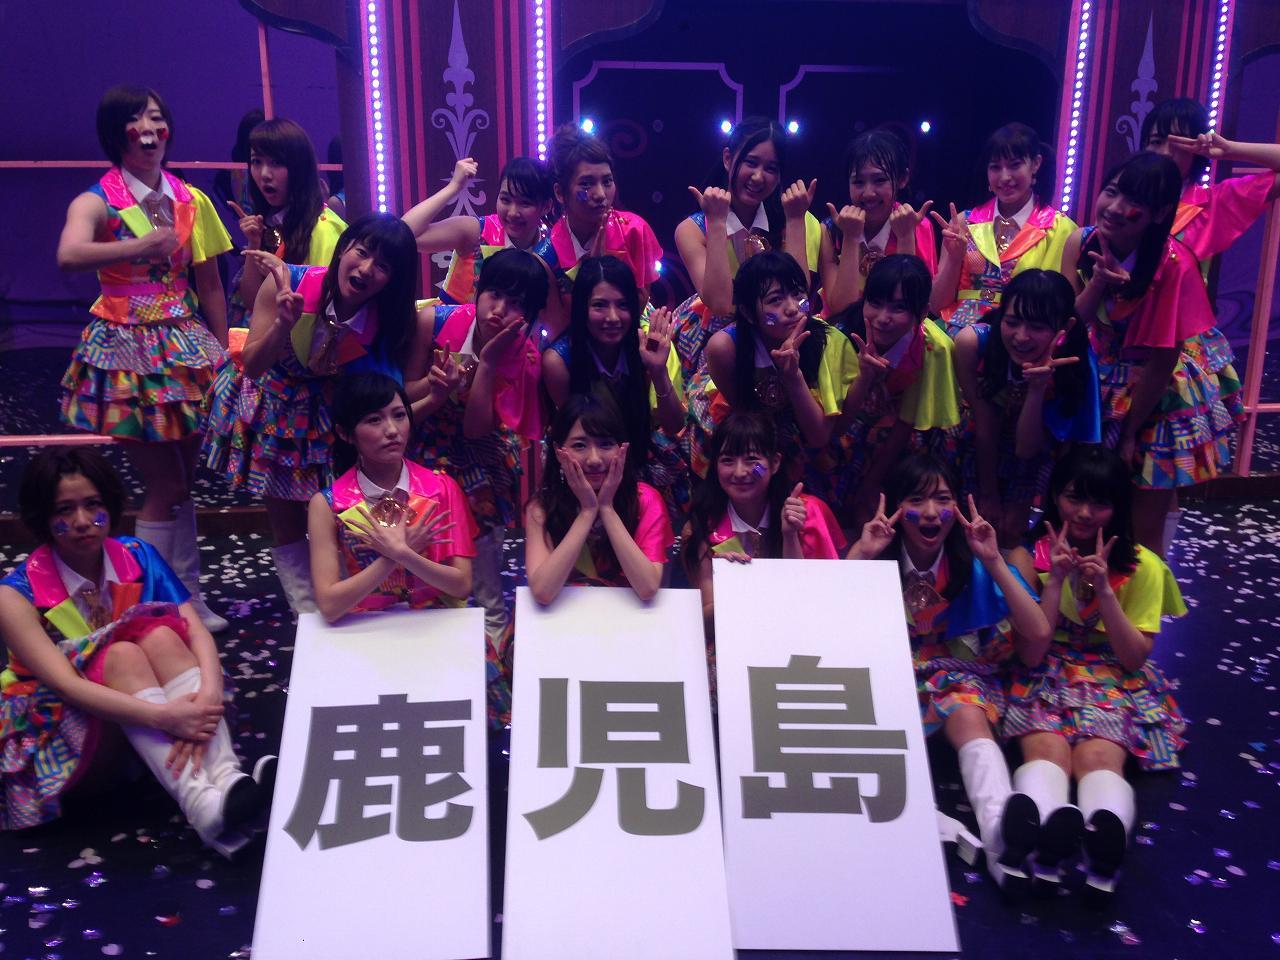 AKB48長崎公演のメンバー集合写真、渡辺麻友